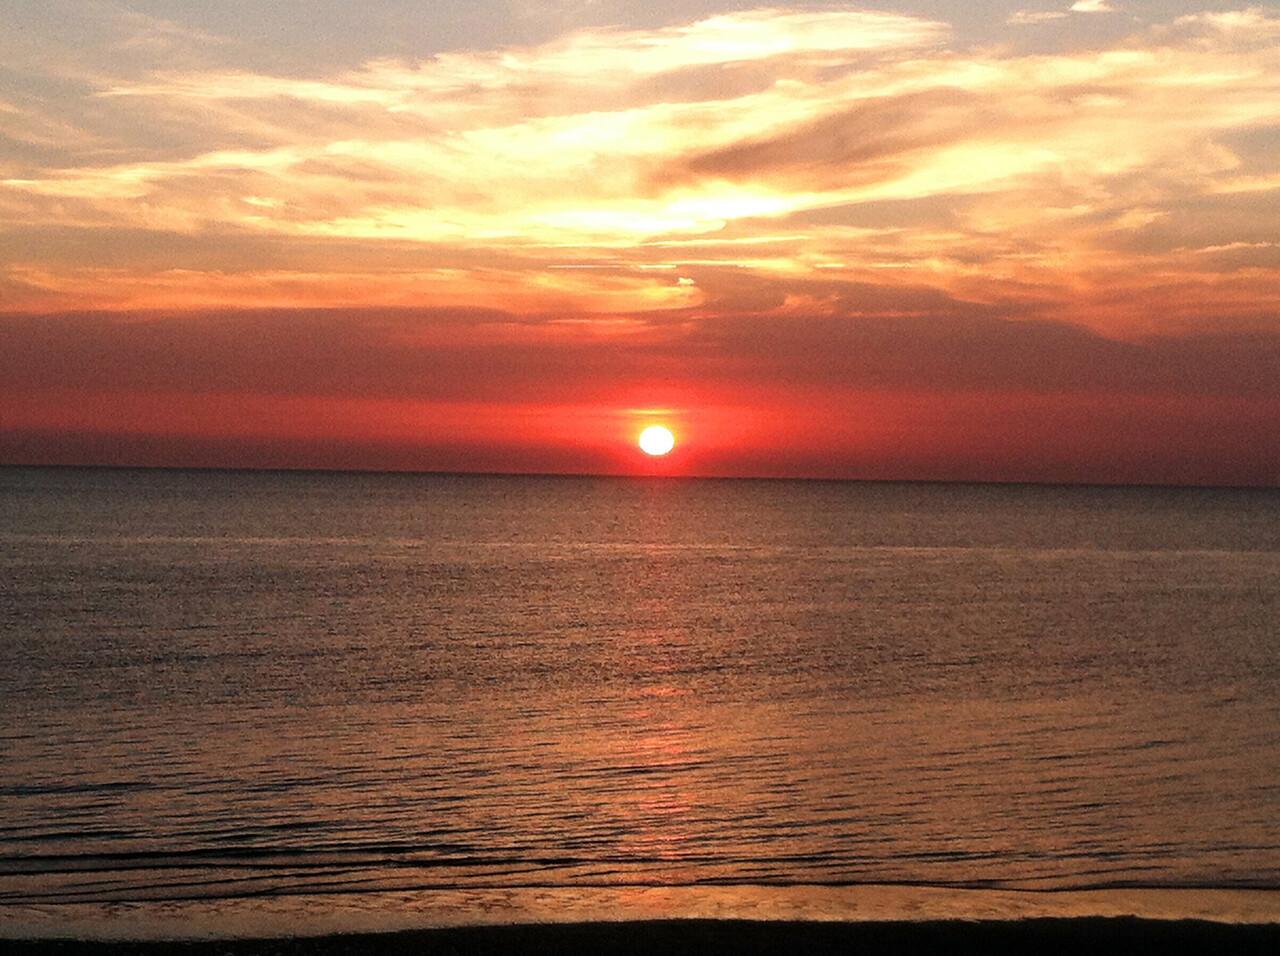 Sunset over the Delaware Bay, Villas, NJ